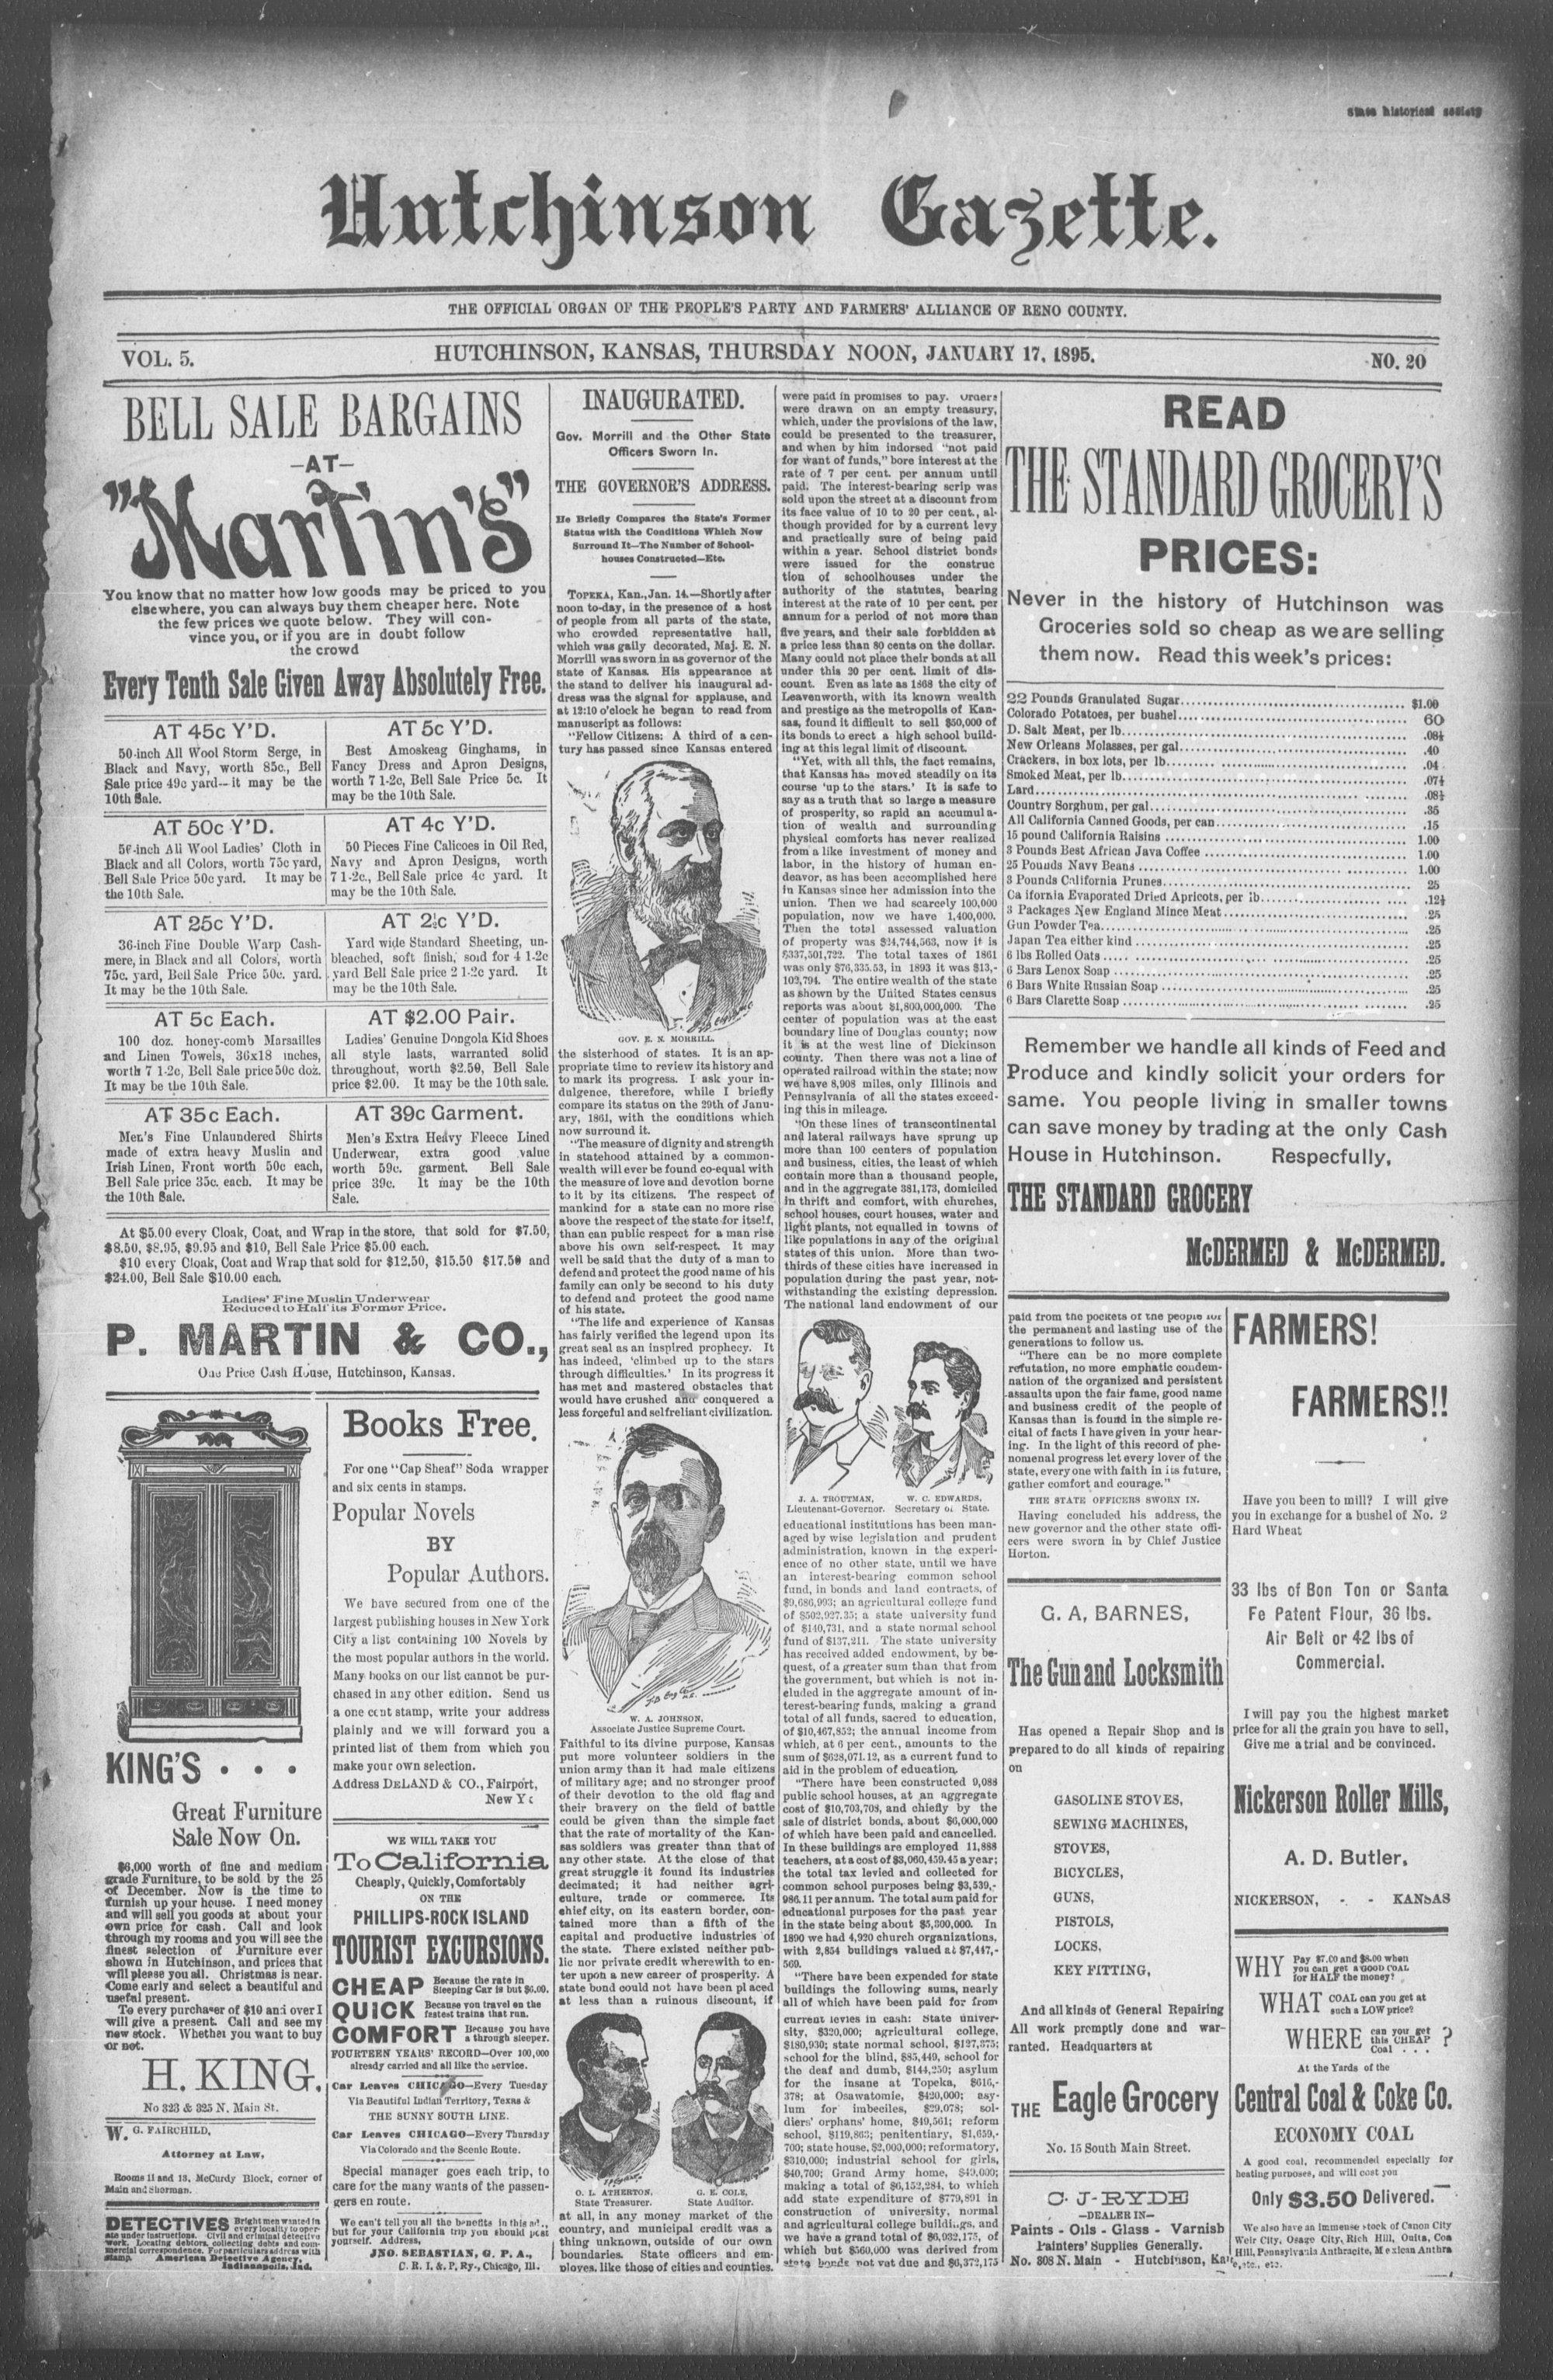 Hutchinson Gazette